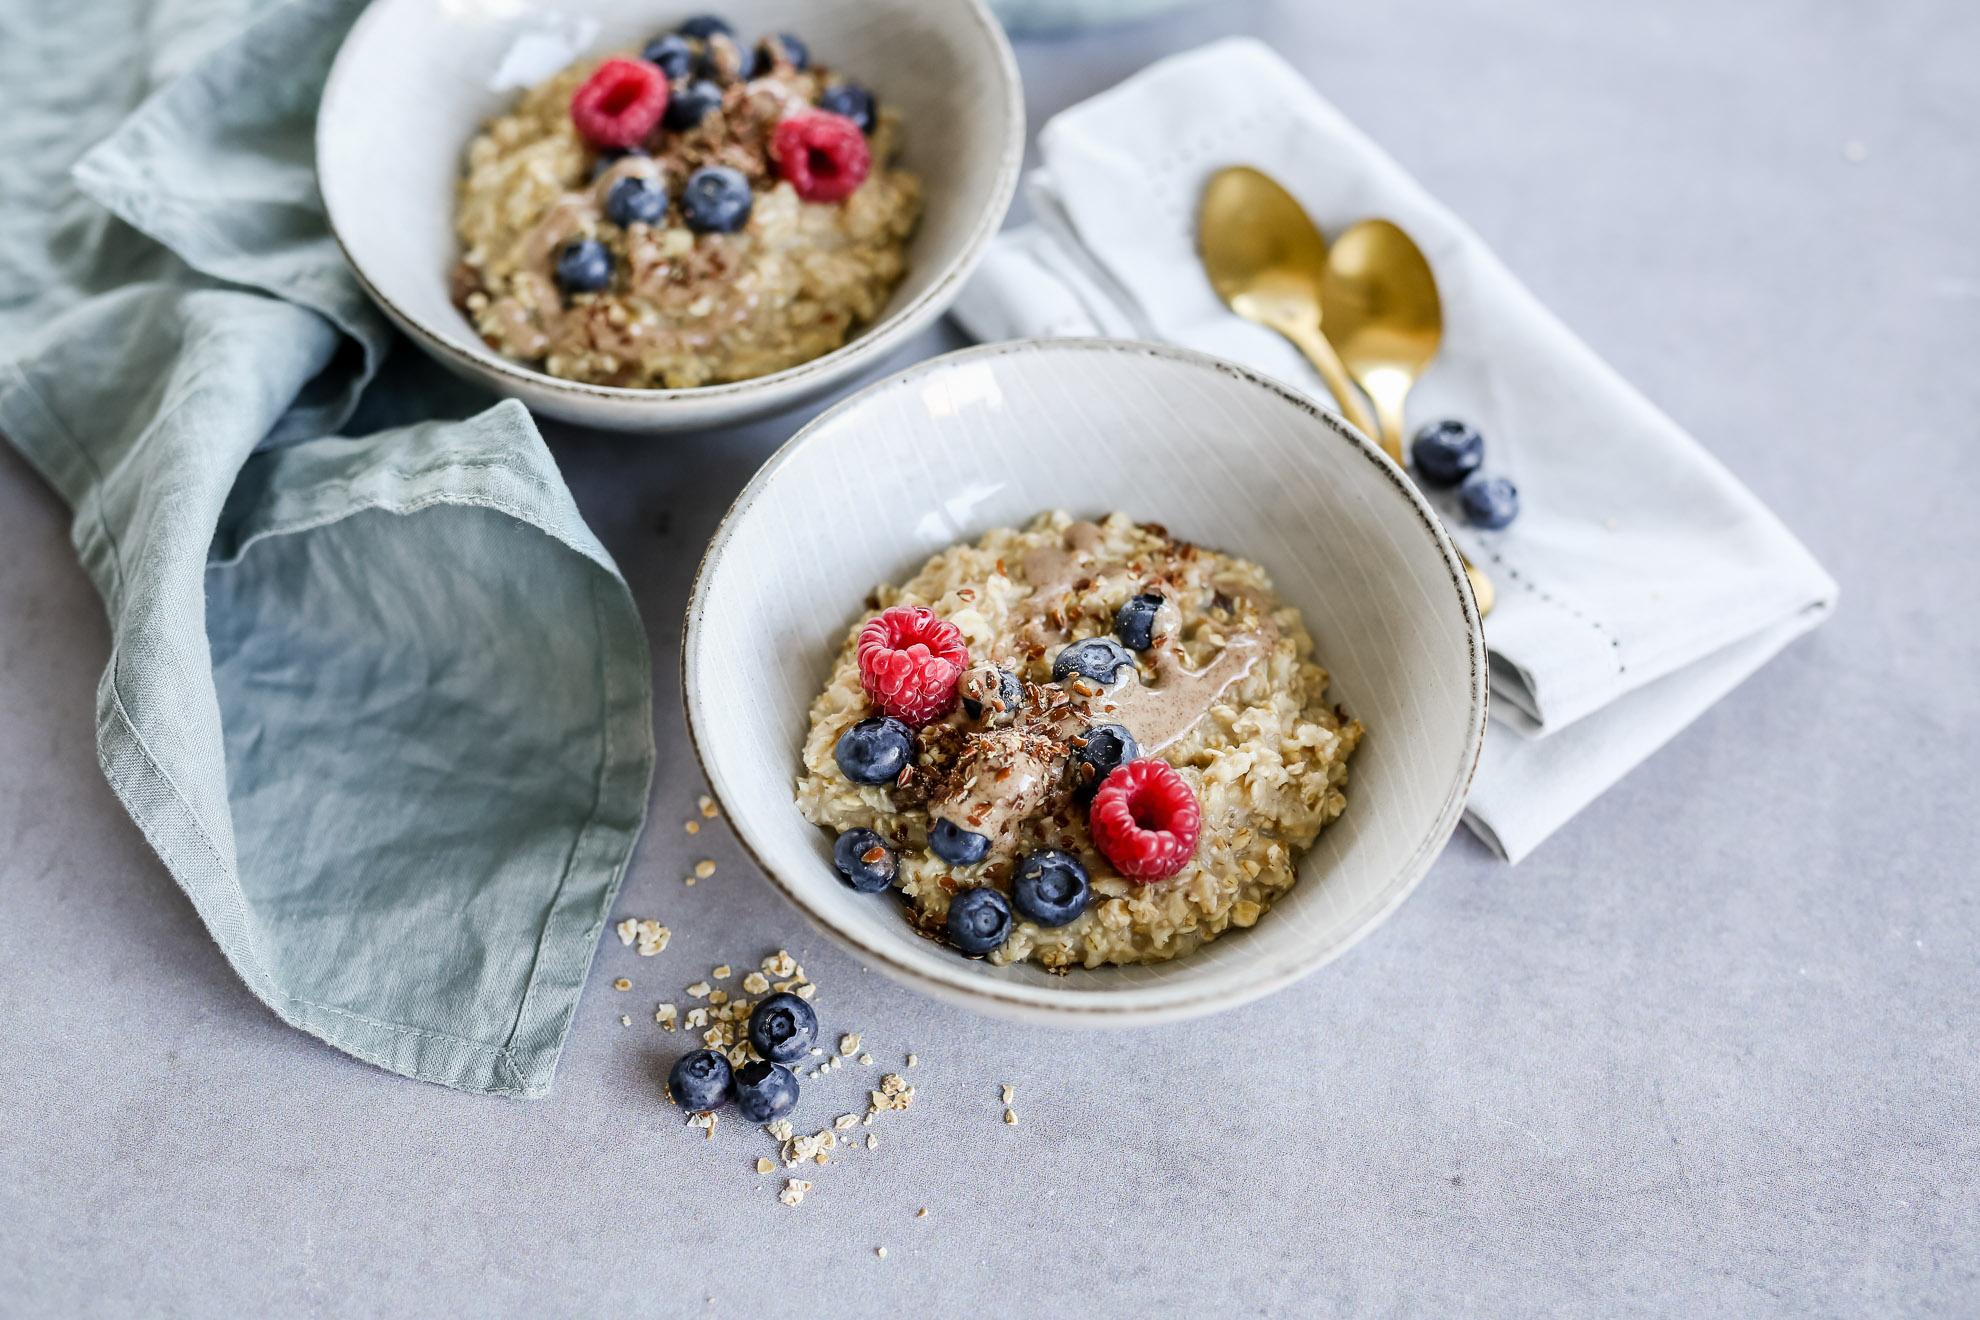 Mein Lieblings Porridge Rezept | Glutenfrei